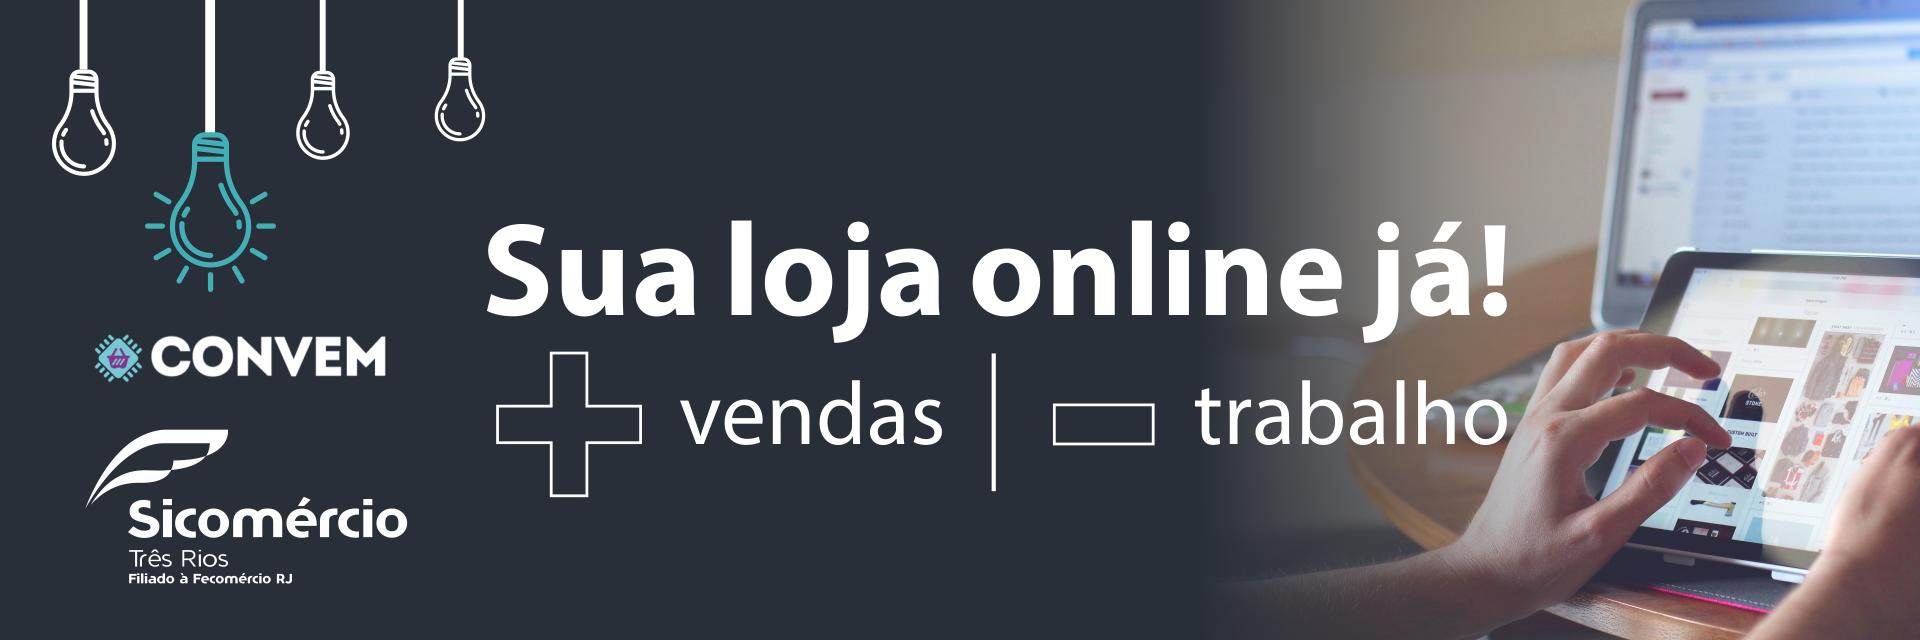 Sua loja online ja